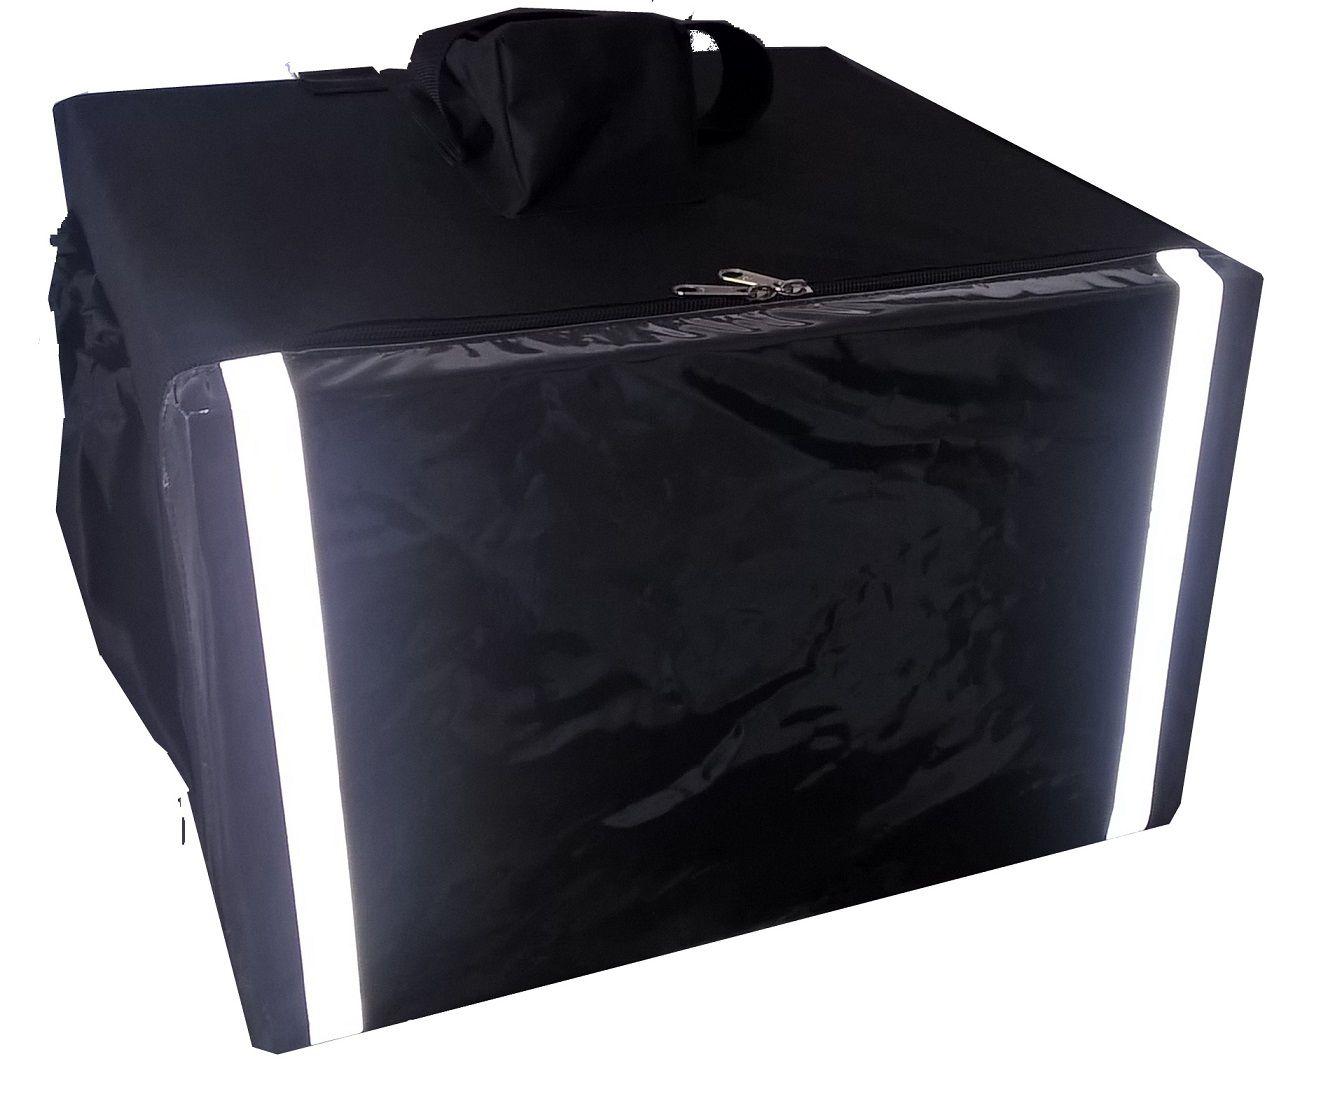 Bolsa Mochila Motoboy Pizza 4 Divisórias Alumínio 53cm 3dval  - GuerreiroOnline